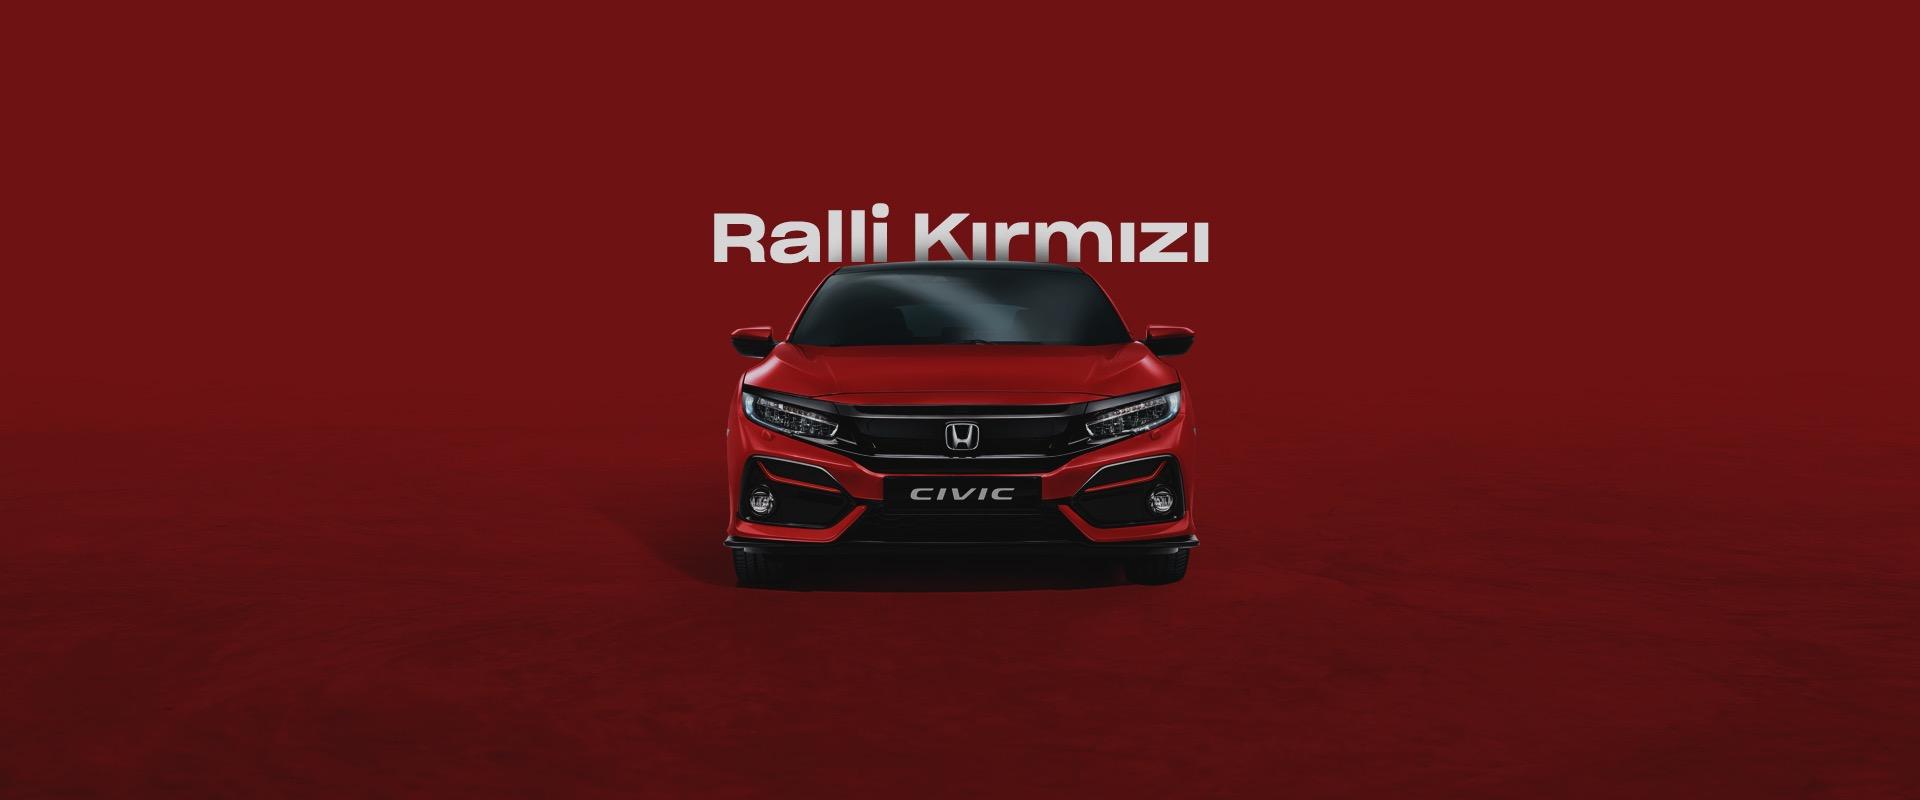 Honda Plaza  Damla Ralli Kırmızısı